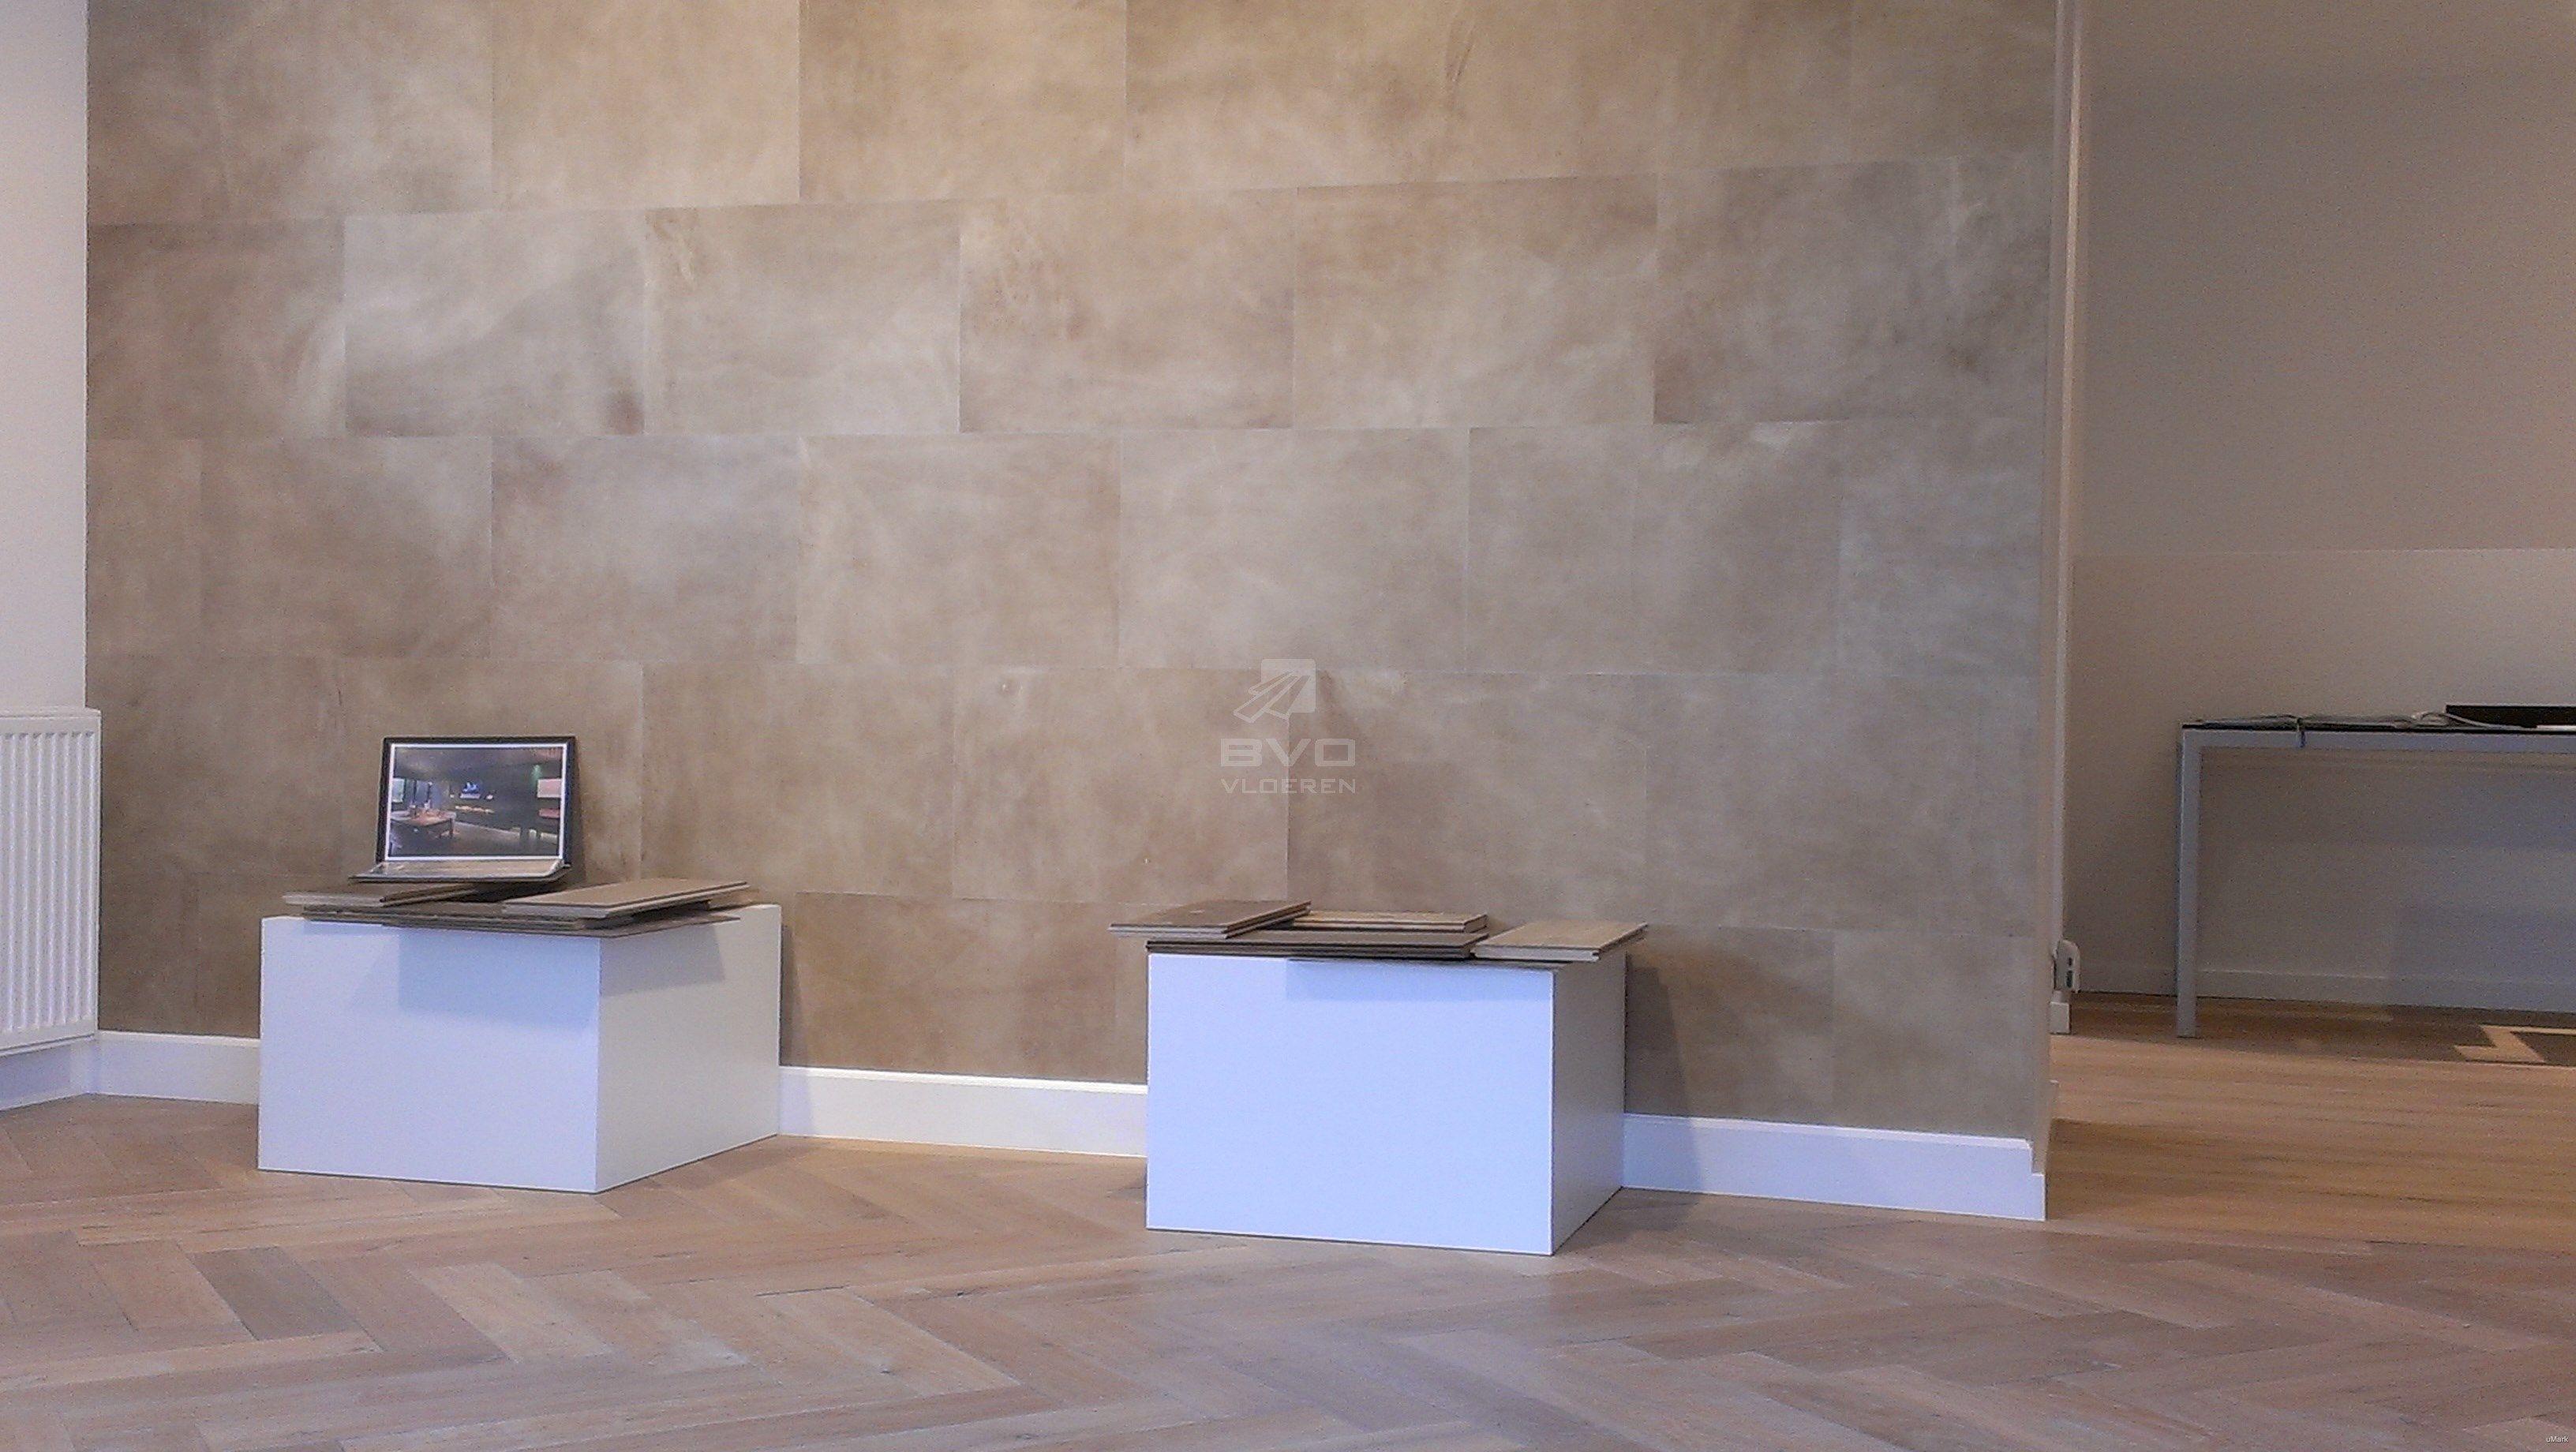 Leer op vloer of muur lederen wandbekleding kleur sand showroom bvo vloeren leren tegels - Deco keuken kleur ...